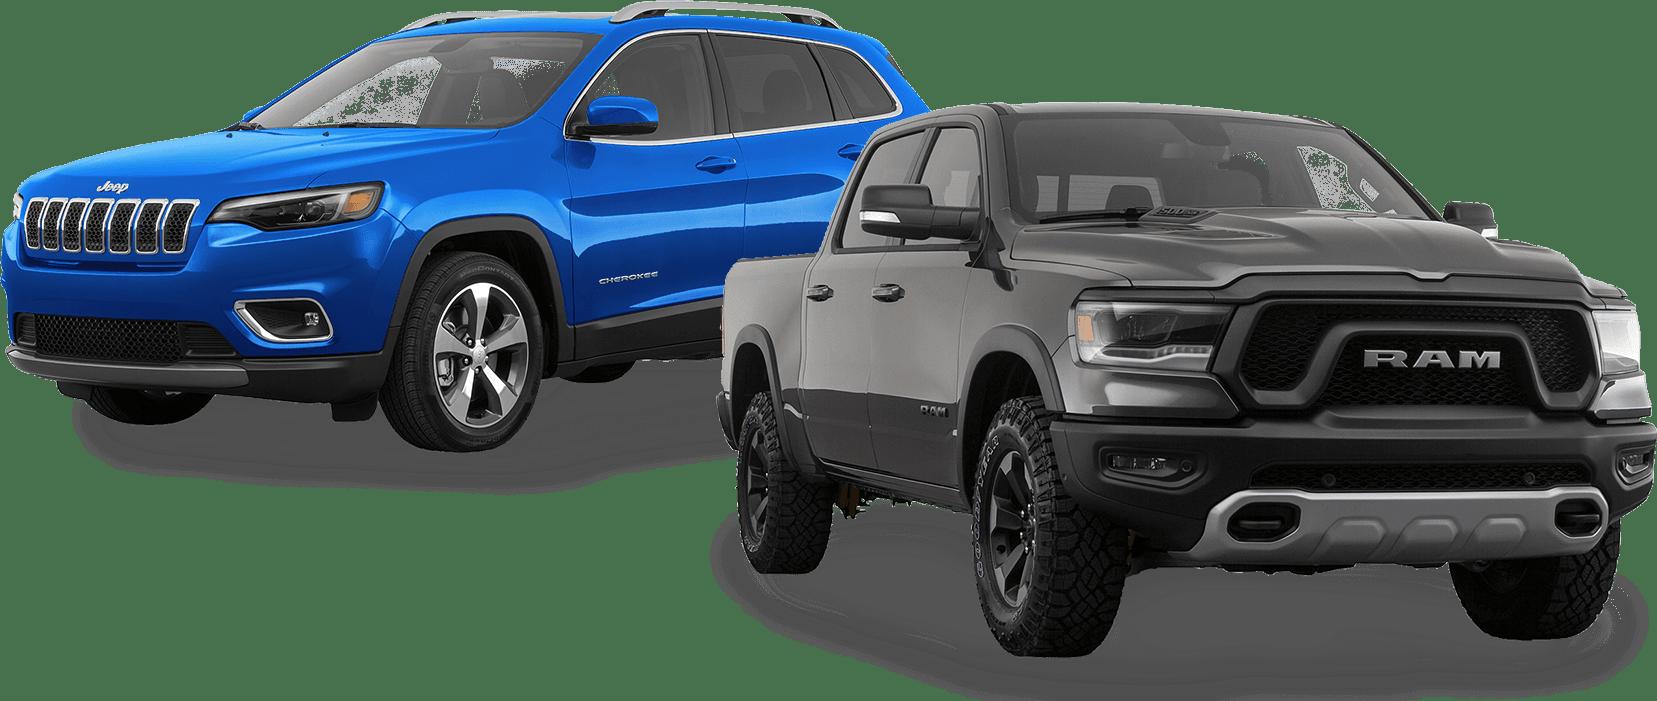 Vehicles_TruckandSUV